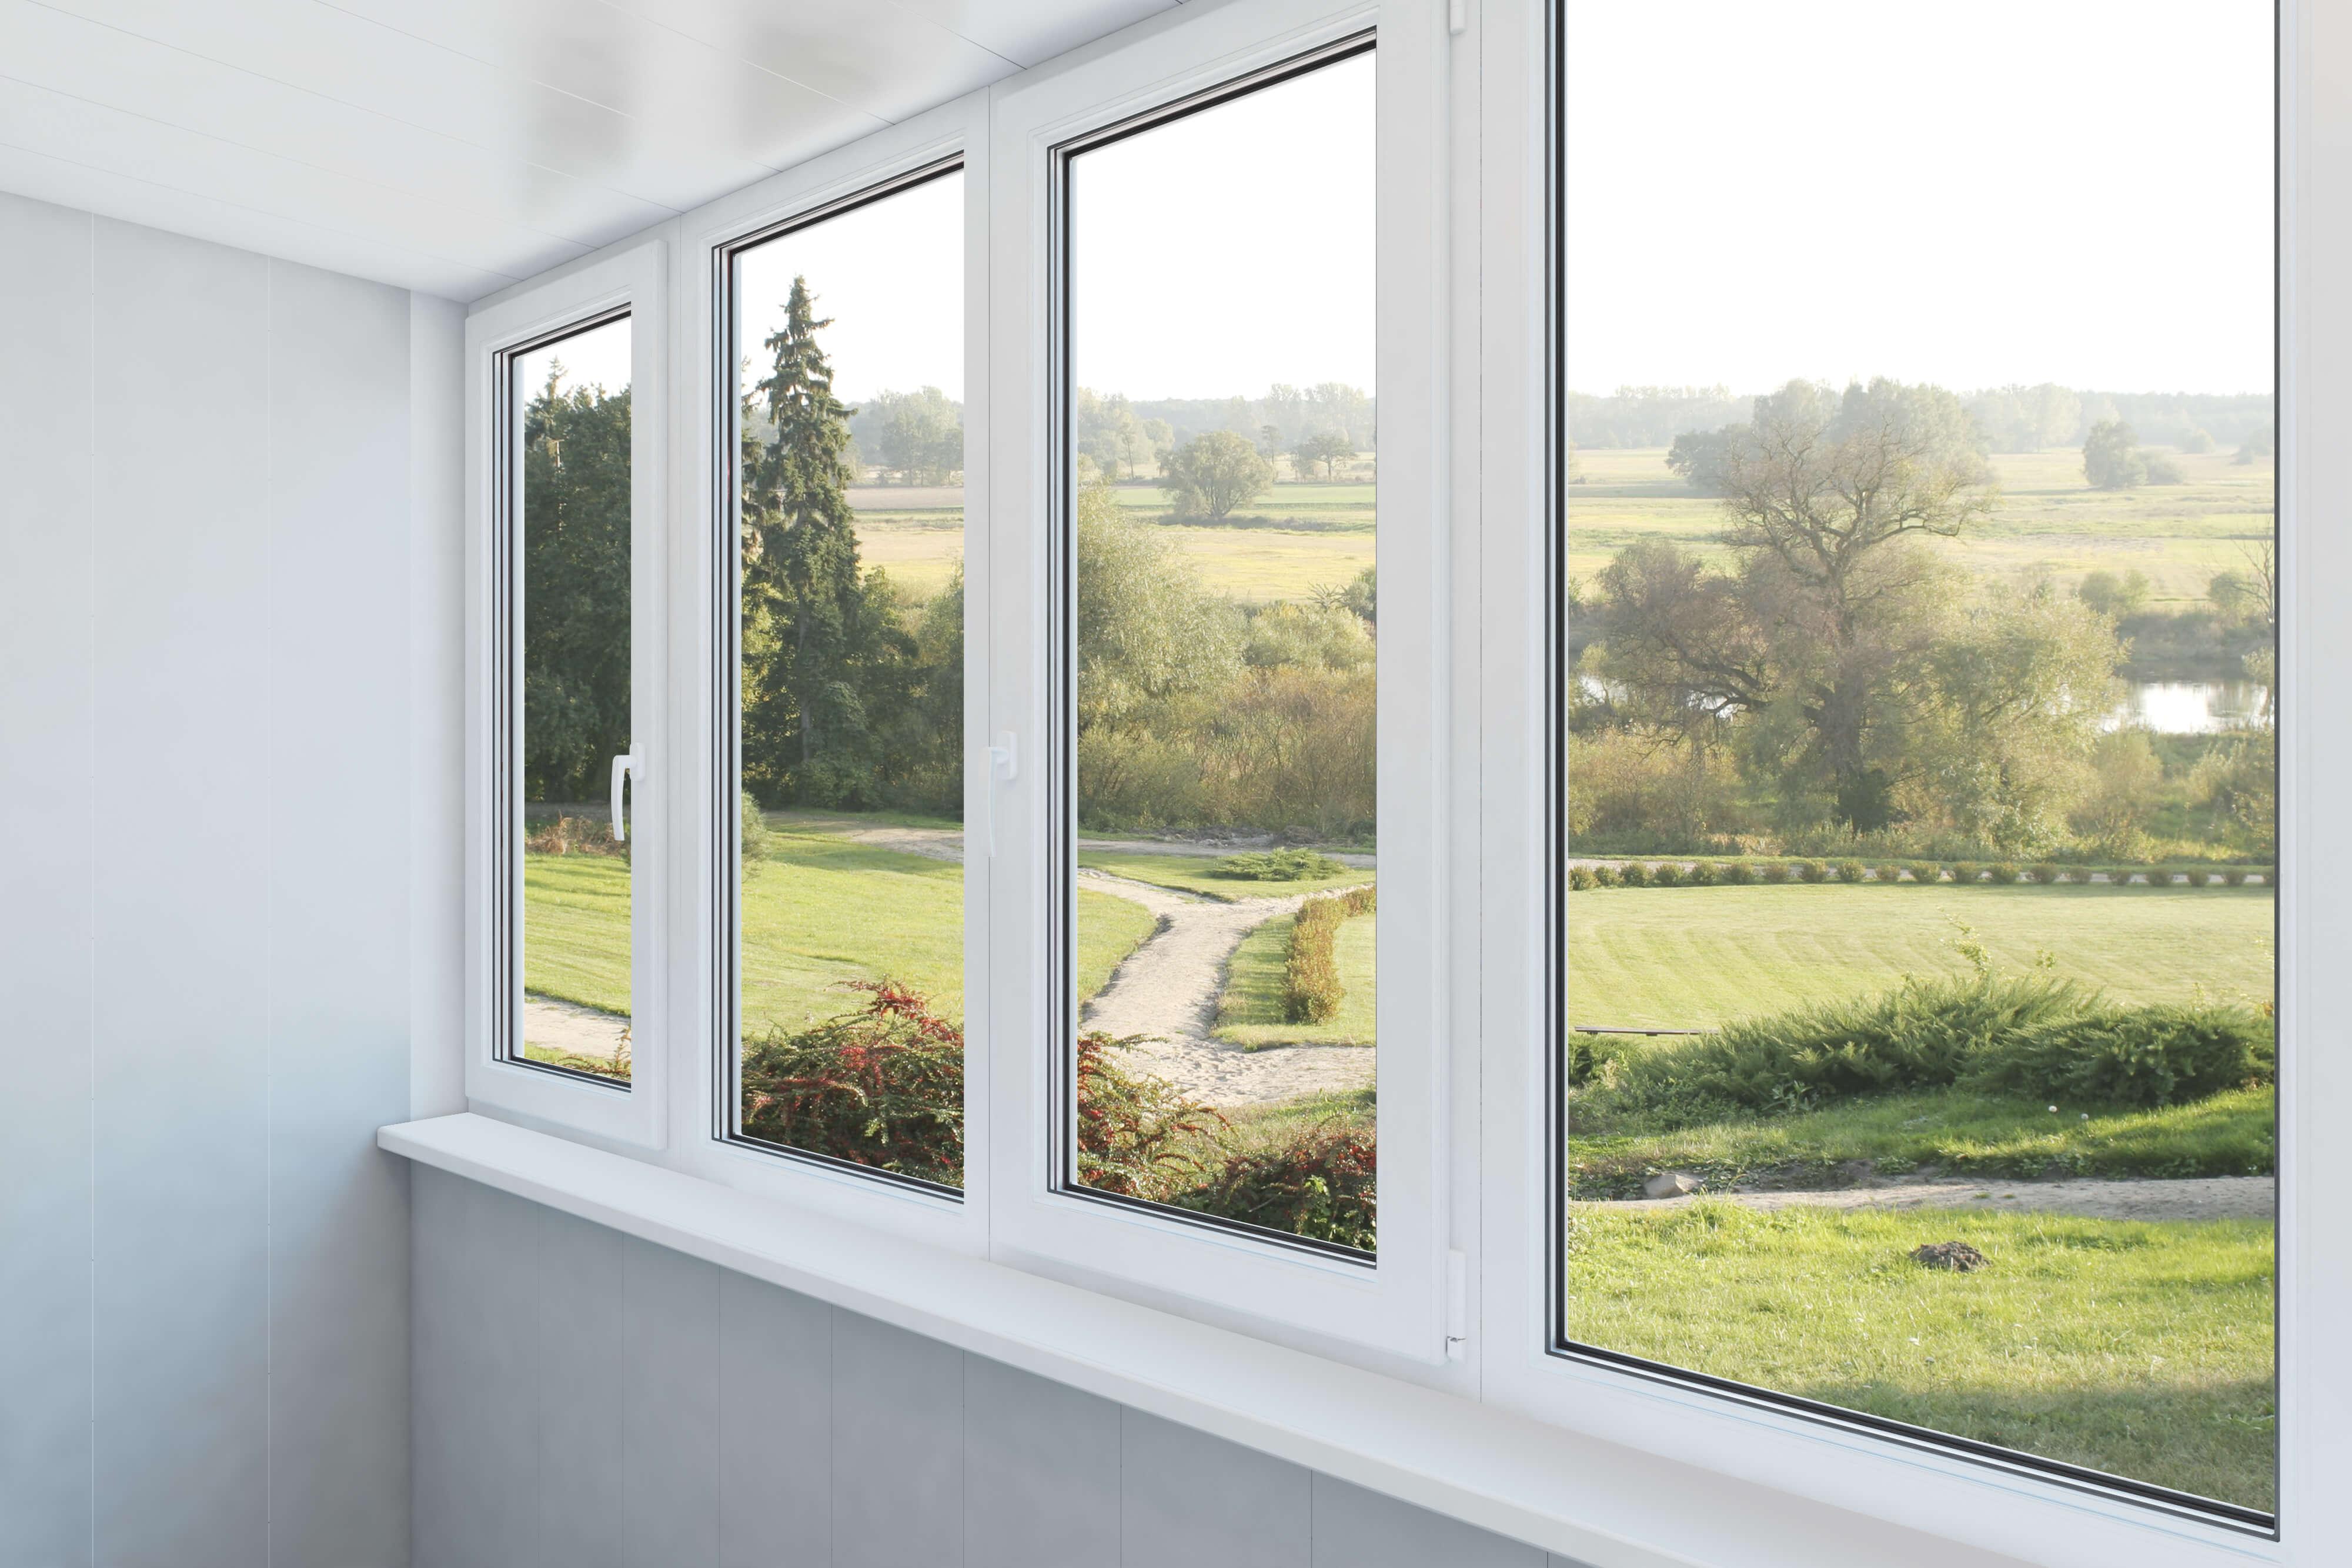 Is Window Installation Easy?